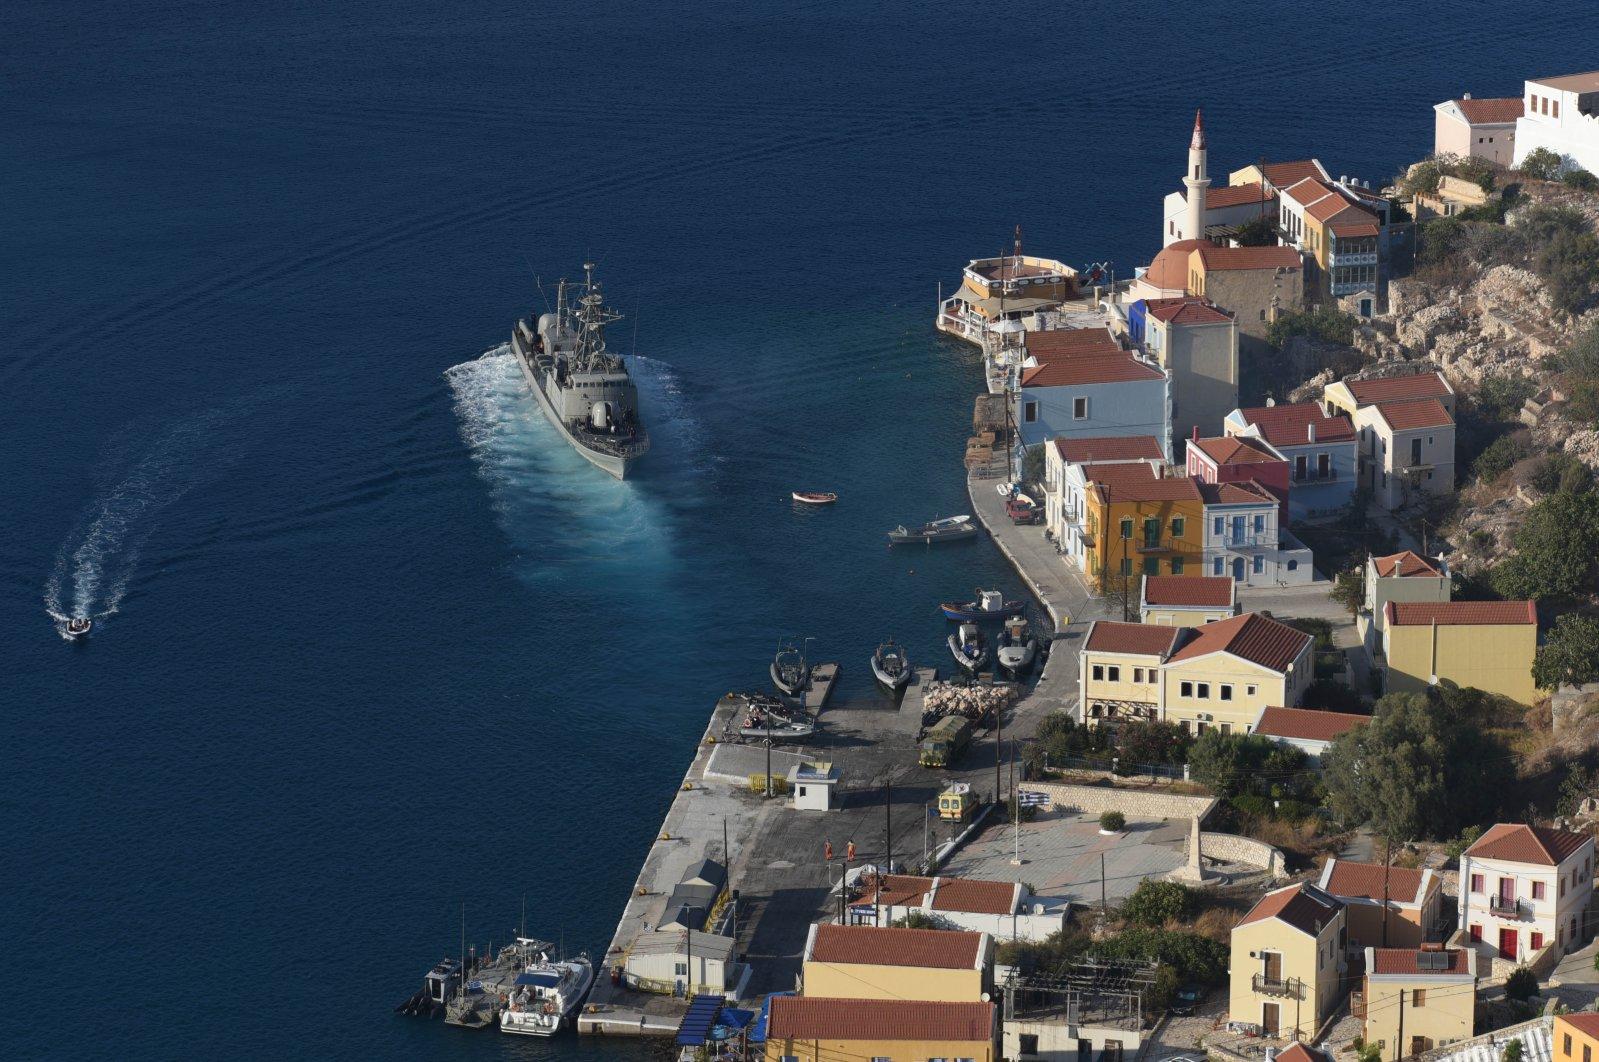 A Greek navy warship off the island of Kastellorizo (Megisti-Meis), Aegean region, Greece, Sept. 8, 2020. (Reuters Photo)